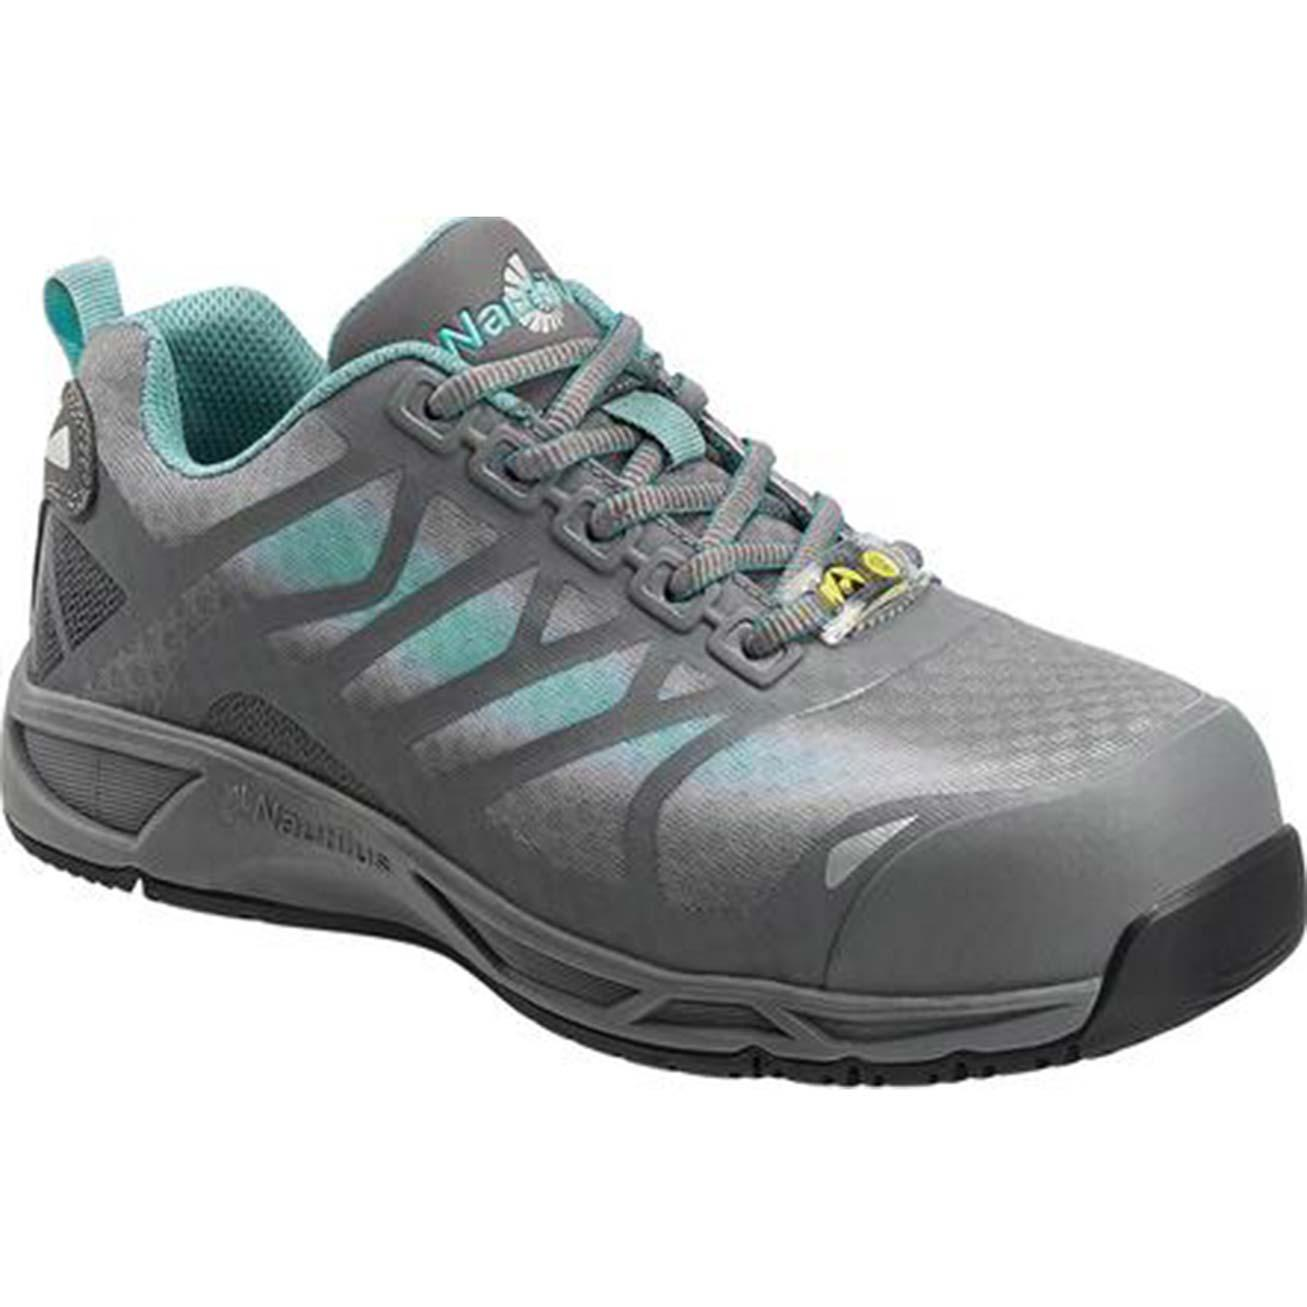 45cd8c78ee2 Nautilus Advanced ESD Women's Carbon Fiber Toe Static-Dissipative Work  Athletic Shoe